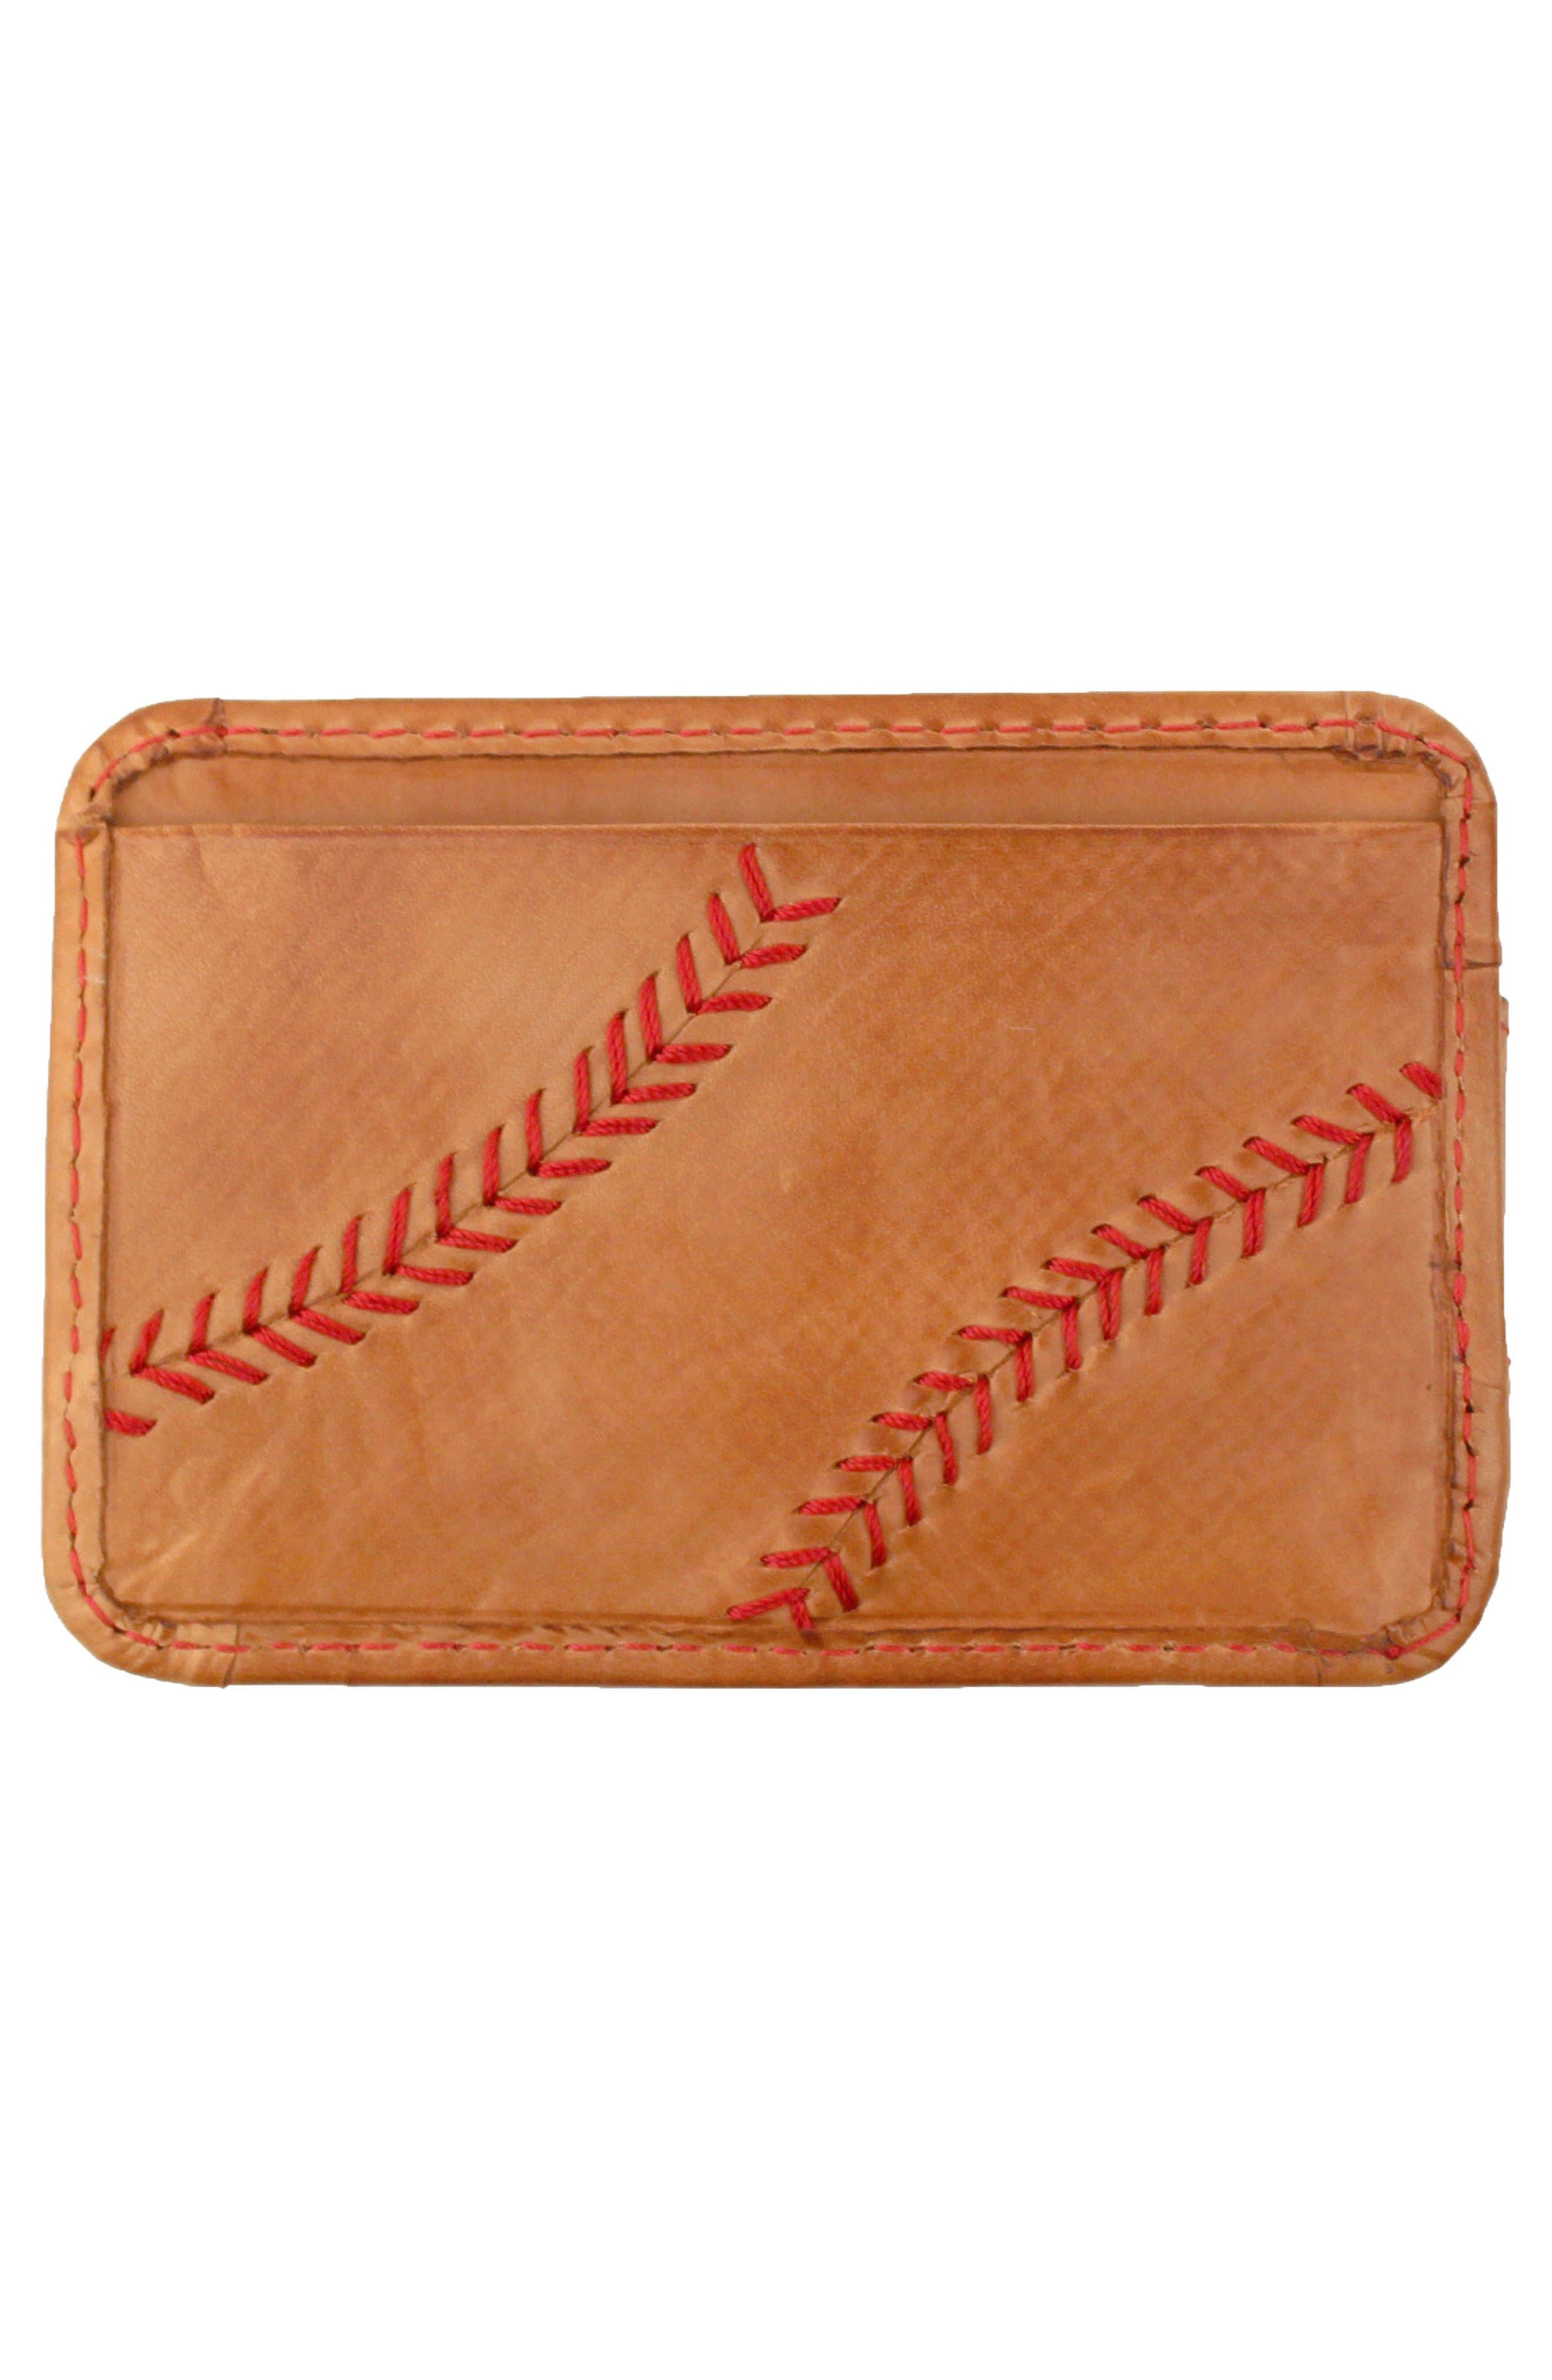 Baseball Stitch Money Clip Card Case,                             Alternate thumbnail 2, color,                             Tan